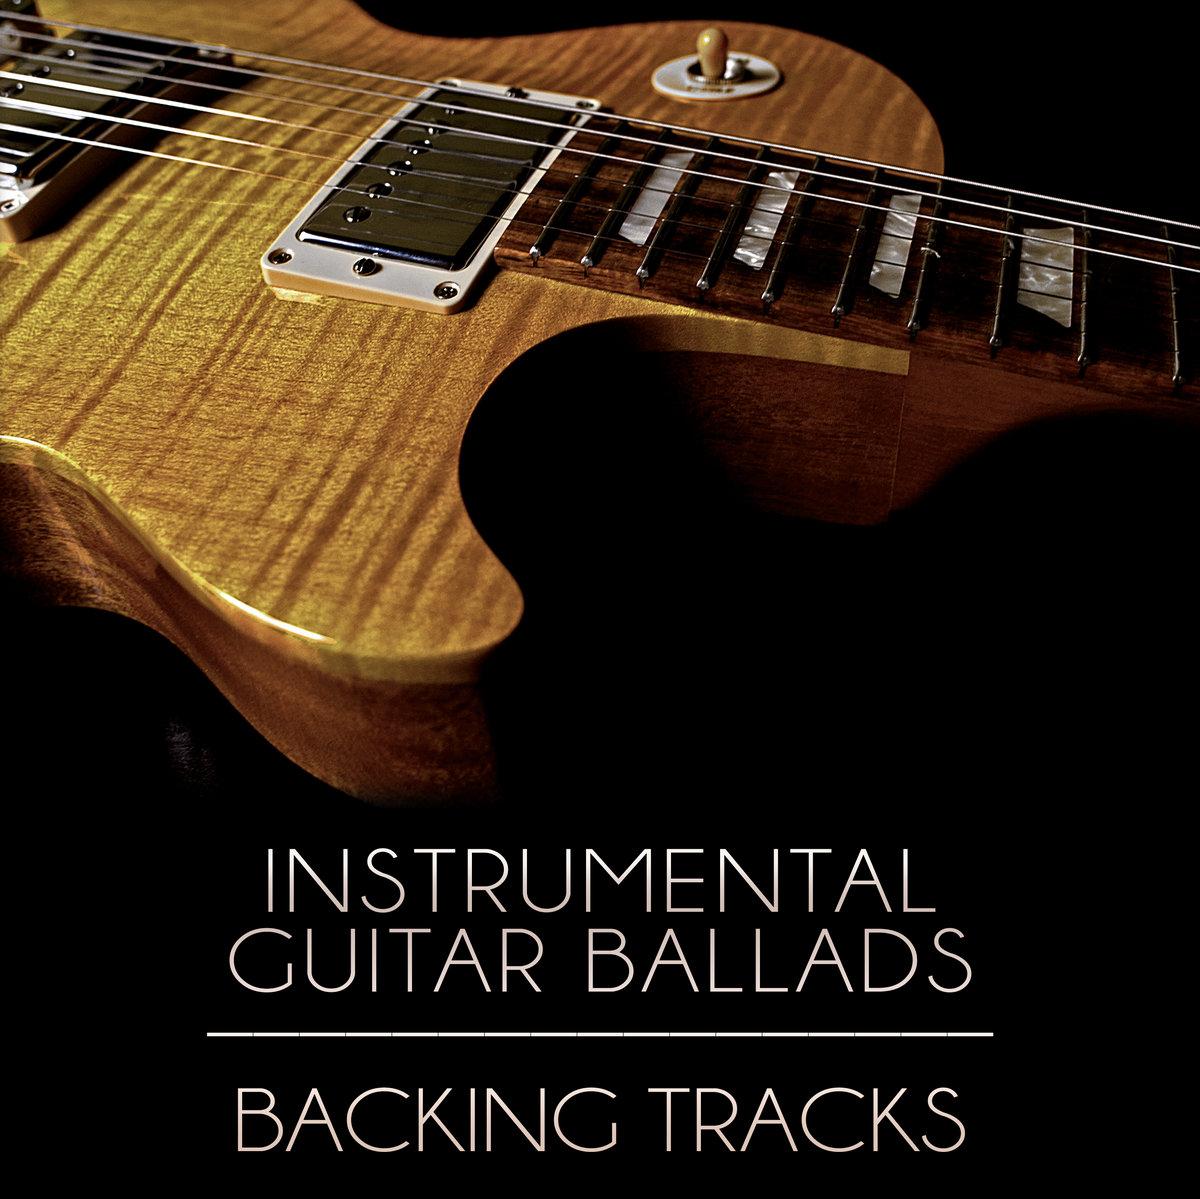 Instrumental Guitar Ballads Backing Tracks Vol  1 | Nick